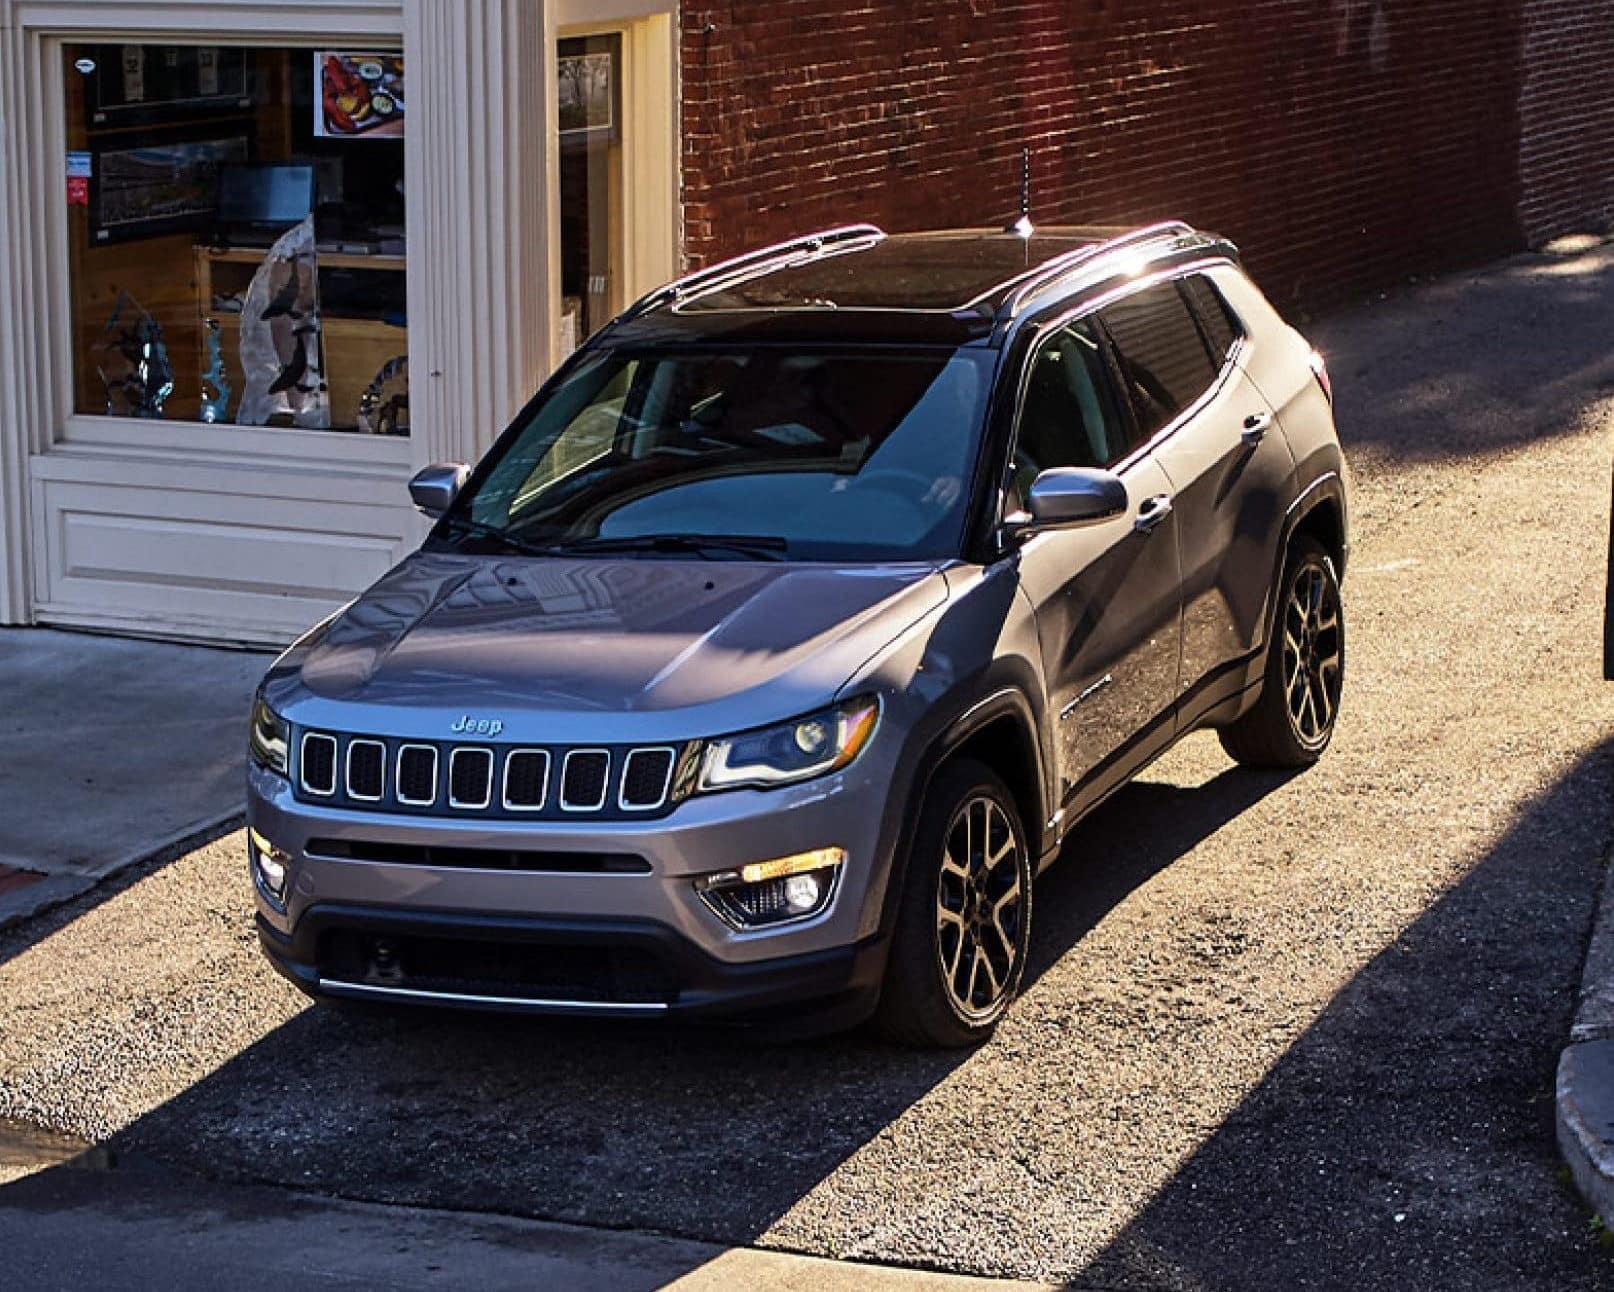 2021-Jeep-Compass-Exterior